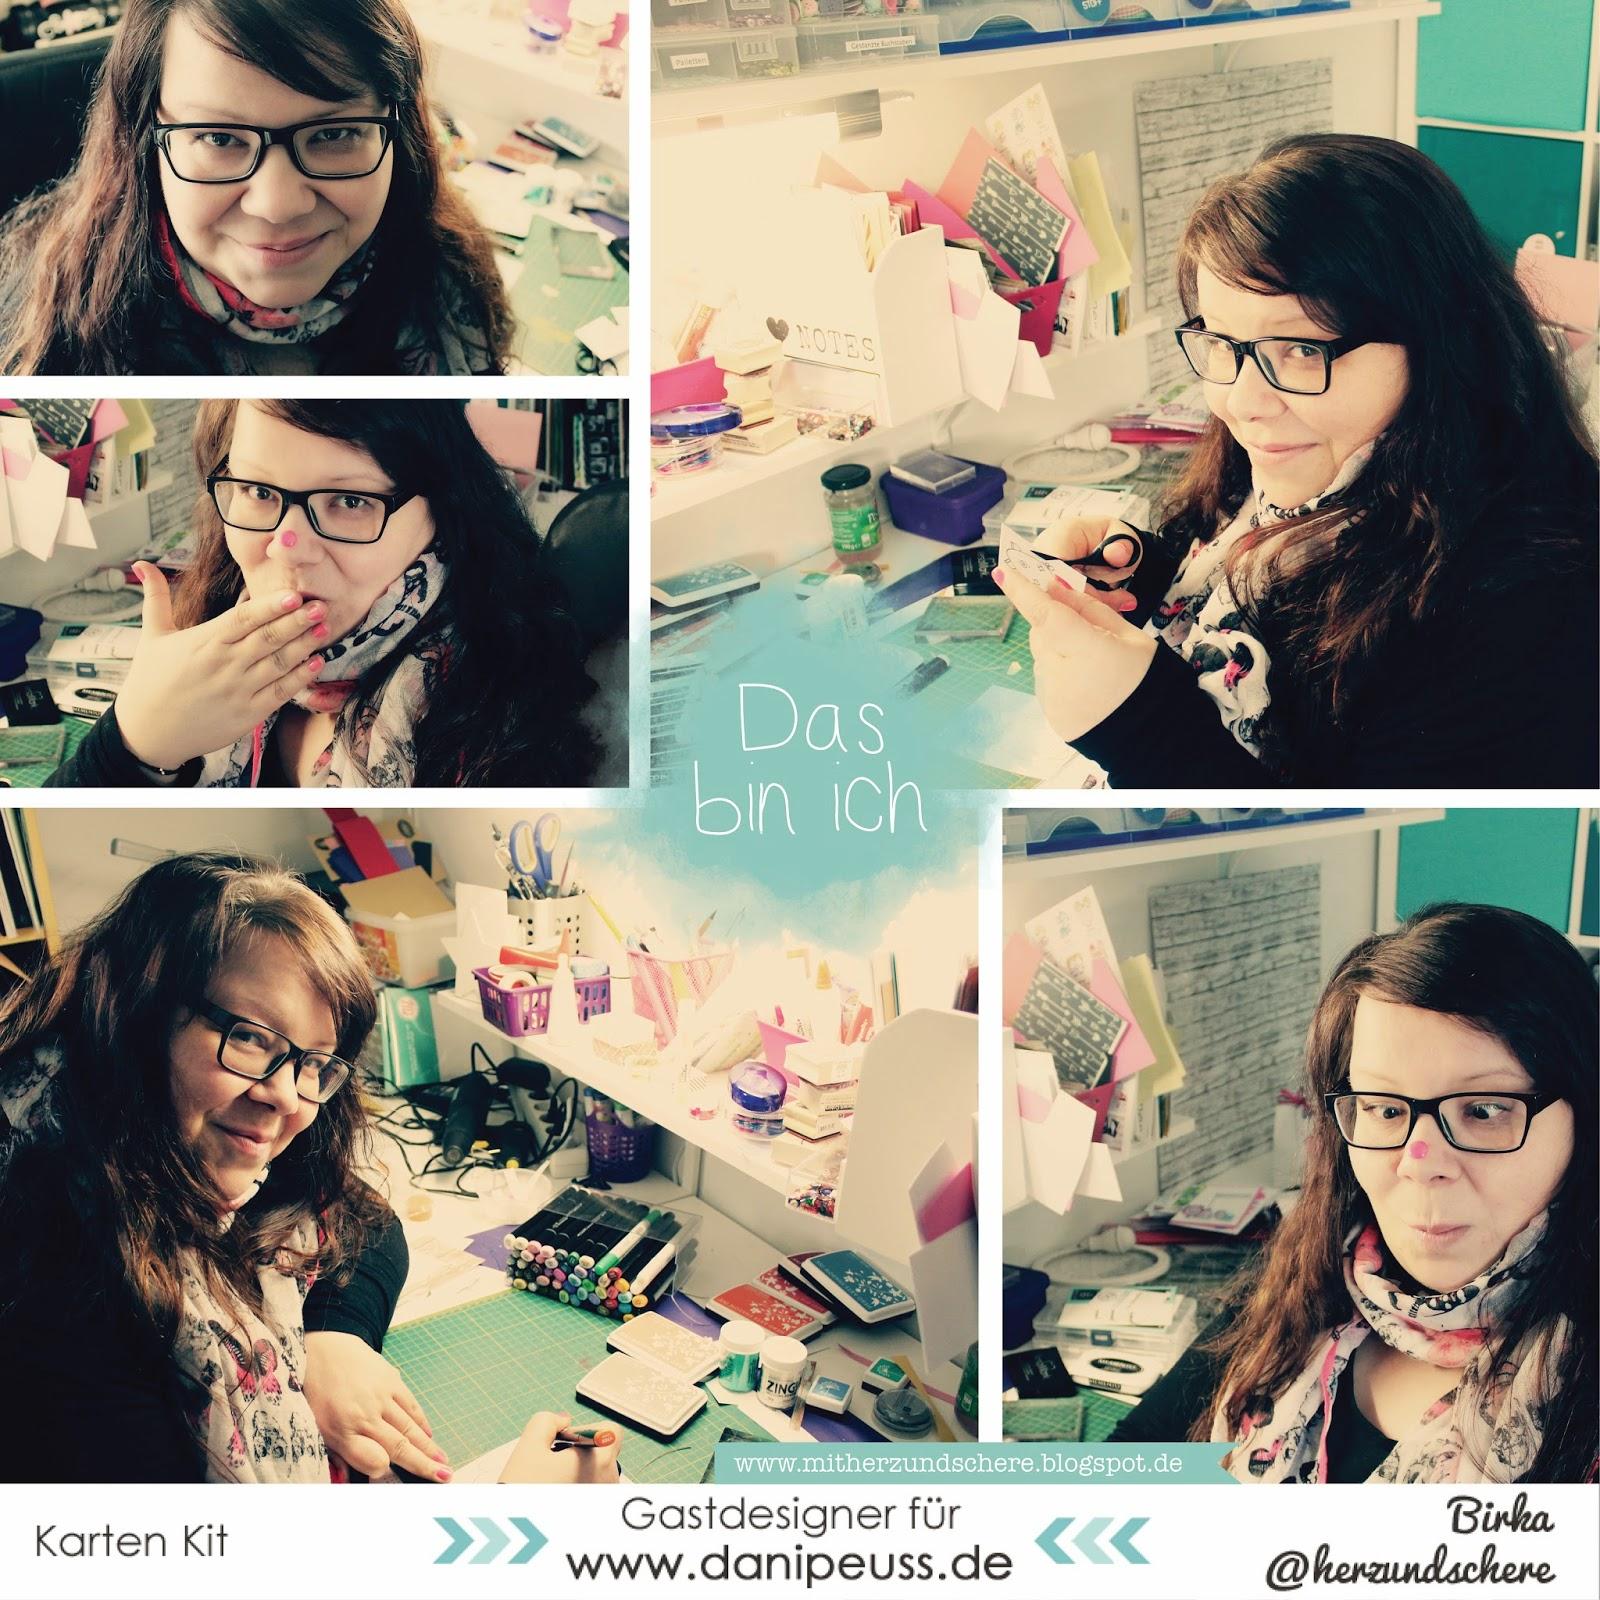 http://danipeuss.blogspot.com/2015/03/vorgestellt-birka-april-kartenkit.html